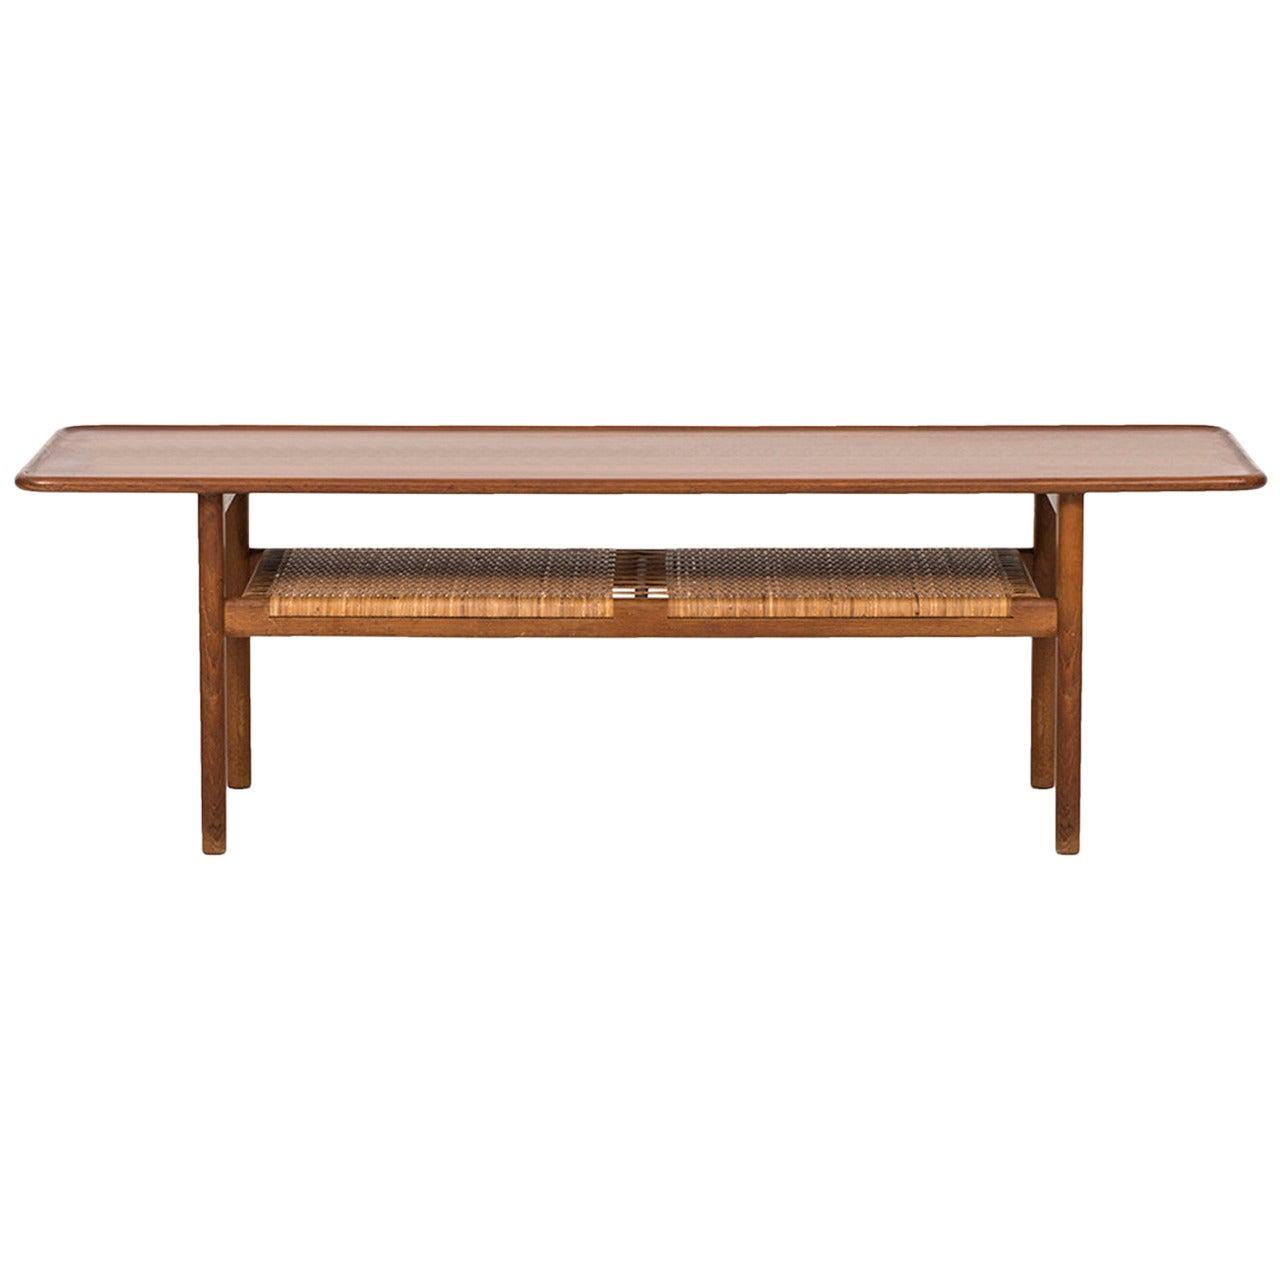 Hans Wegner Coffee Table Model AT-10 by Andreas Tuck in Denmark